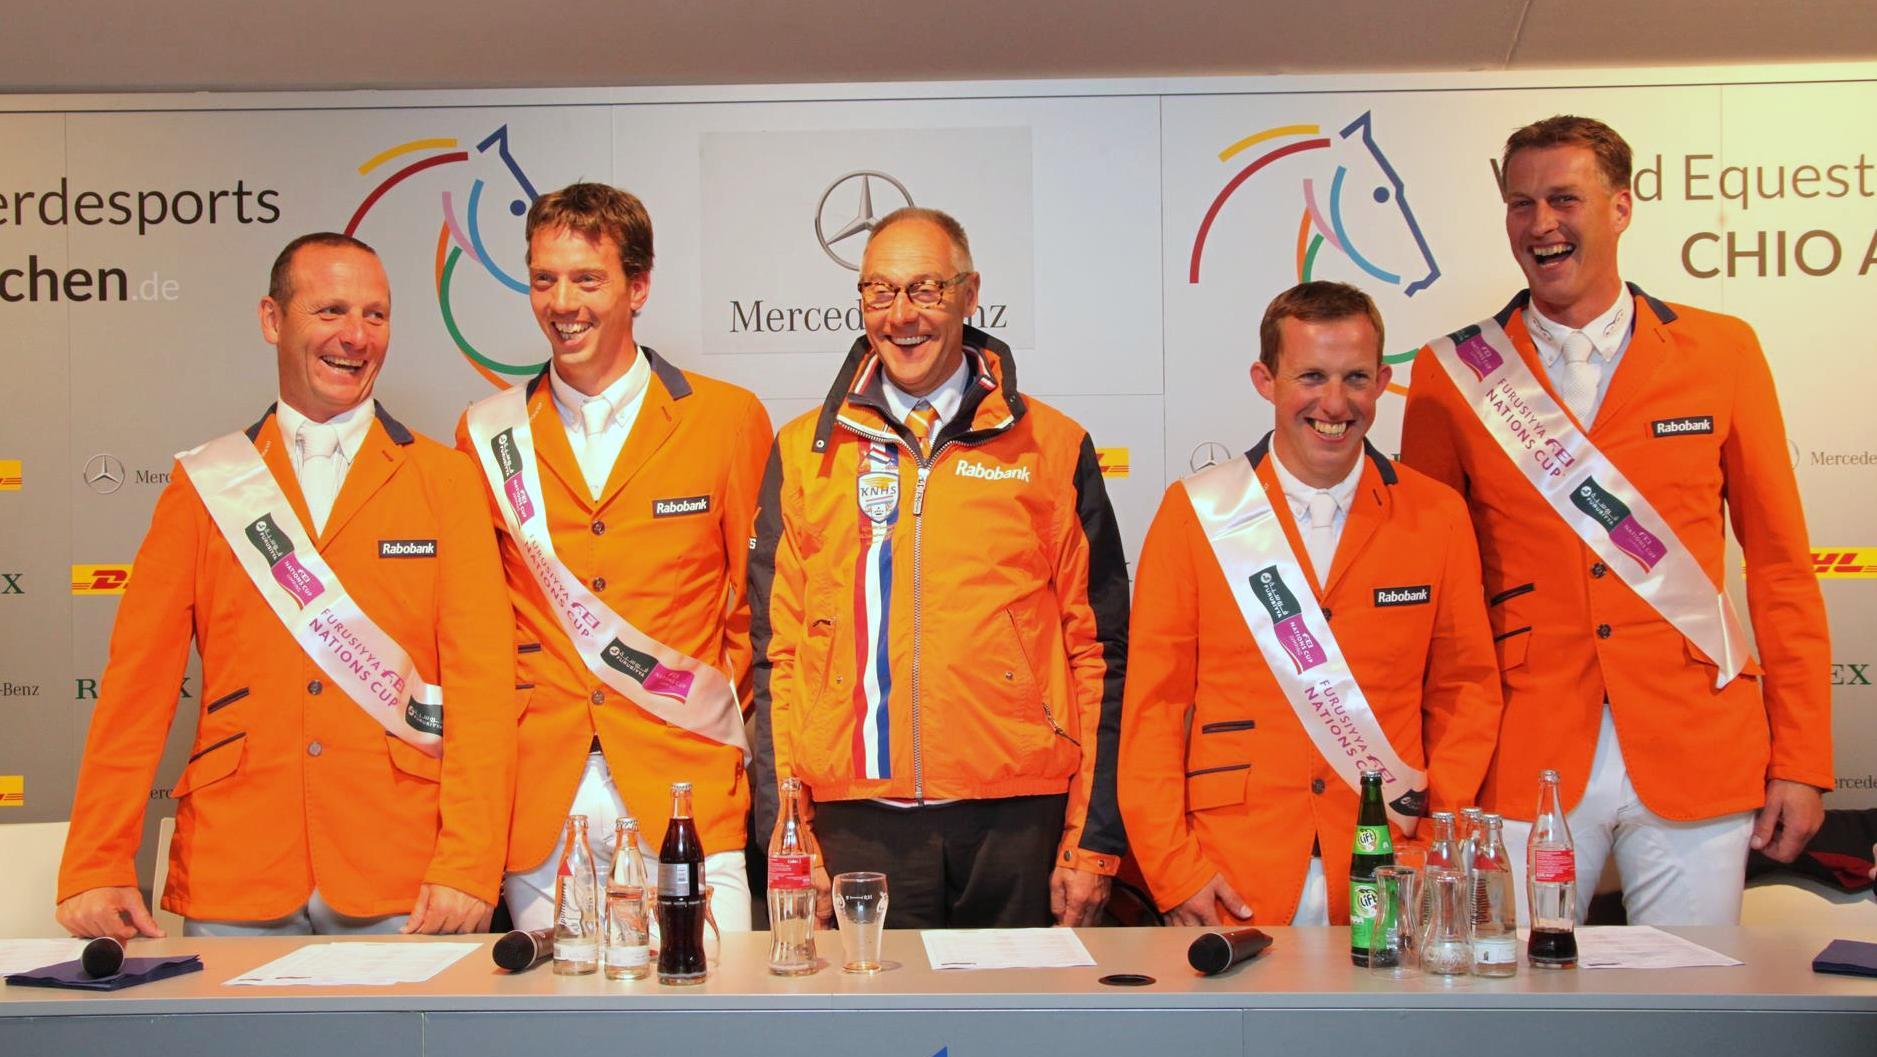 CHIO Aken Nederlandse springruiters